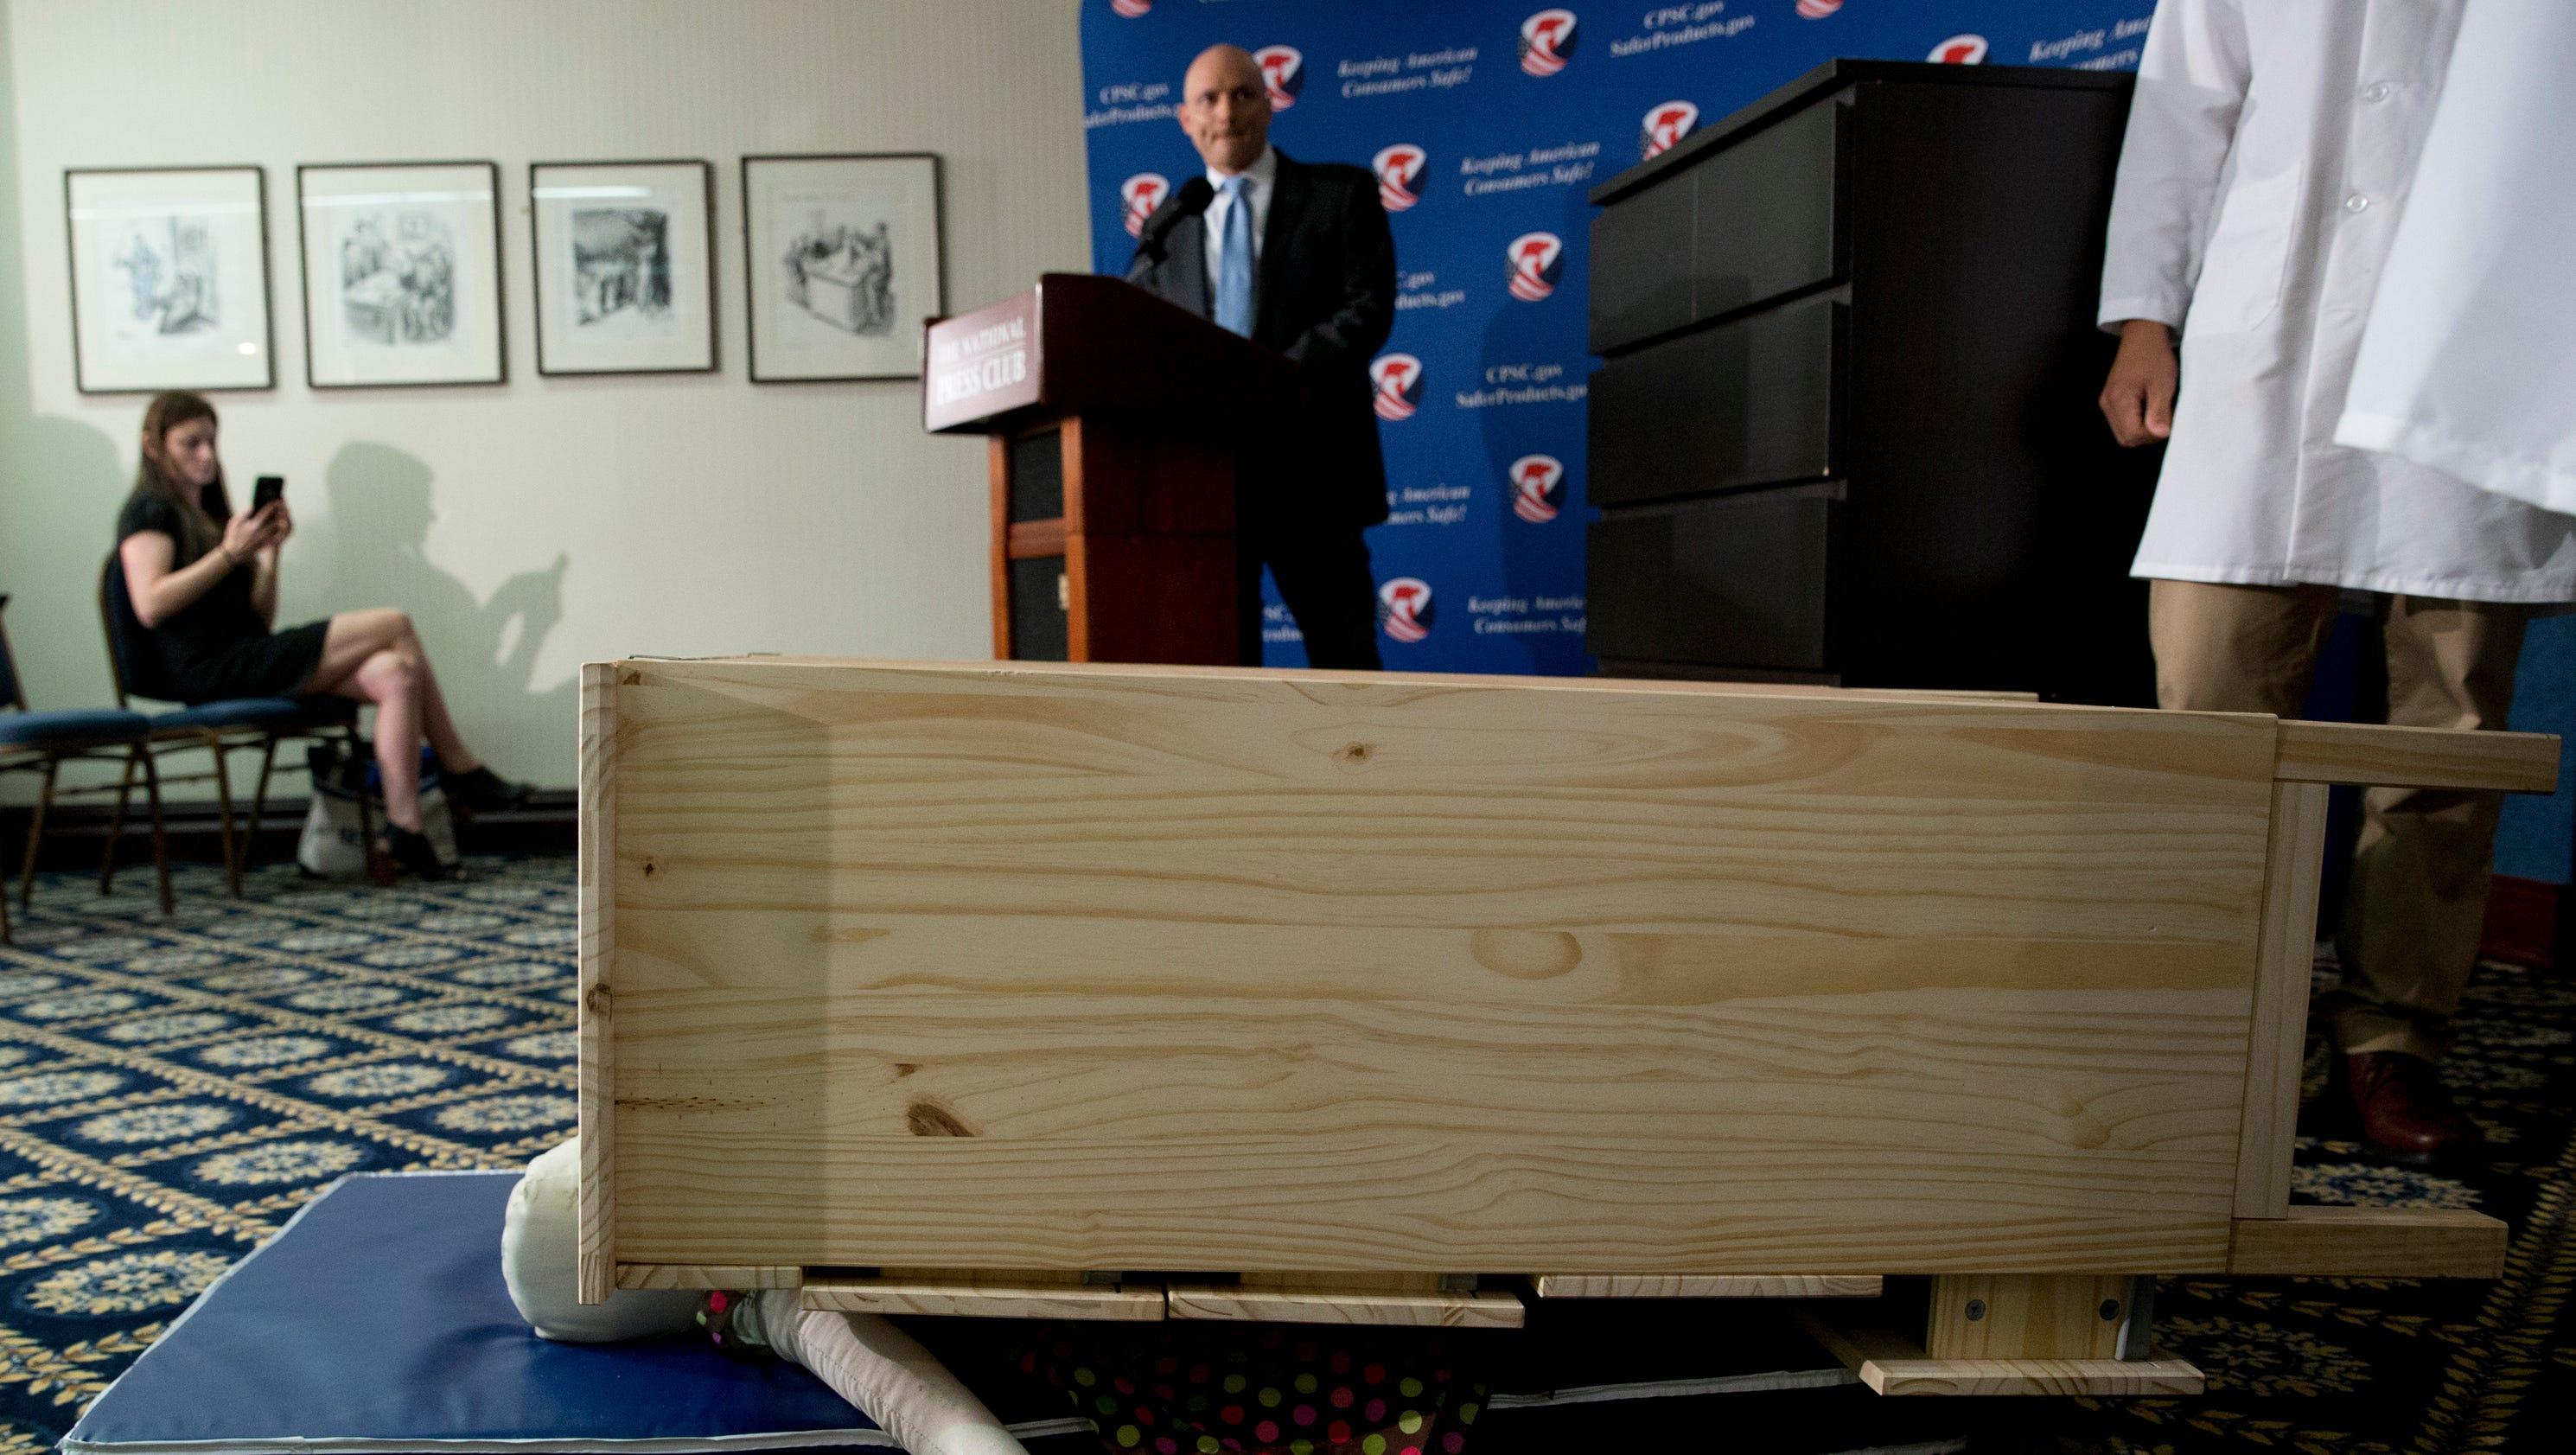 Ikea recalls 29 million dressers after 6 kids killed Ikea security jobs